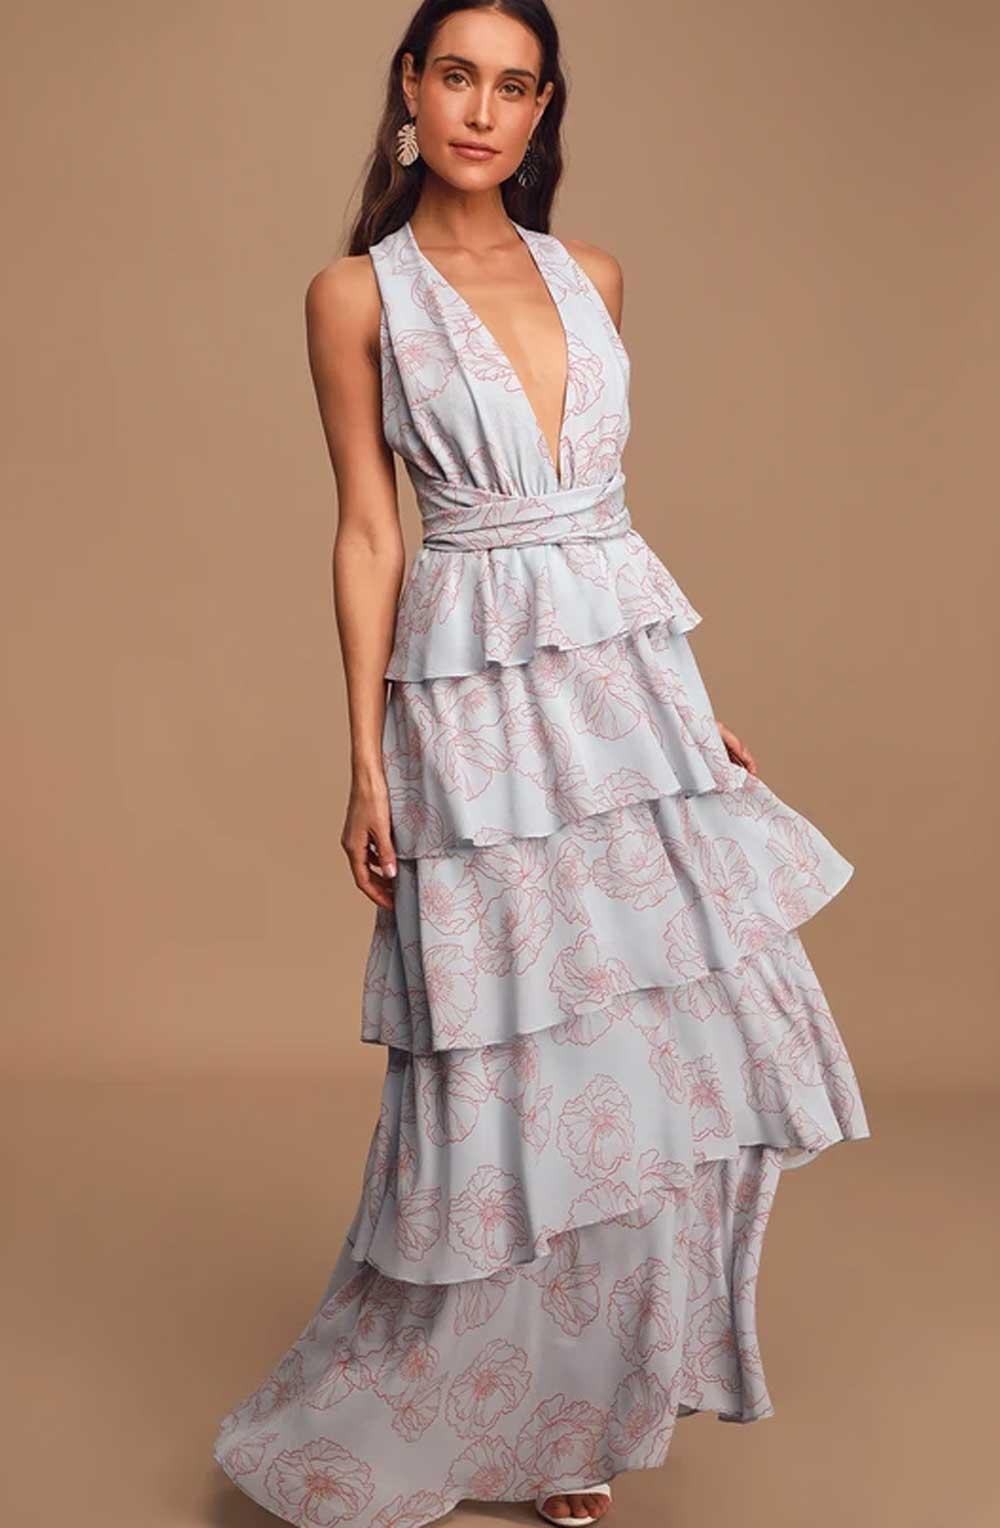 Vestidos de novia largos para niñas 2020